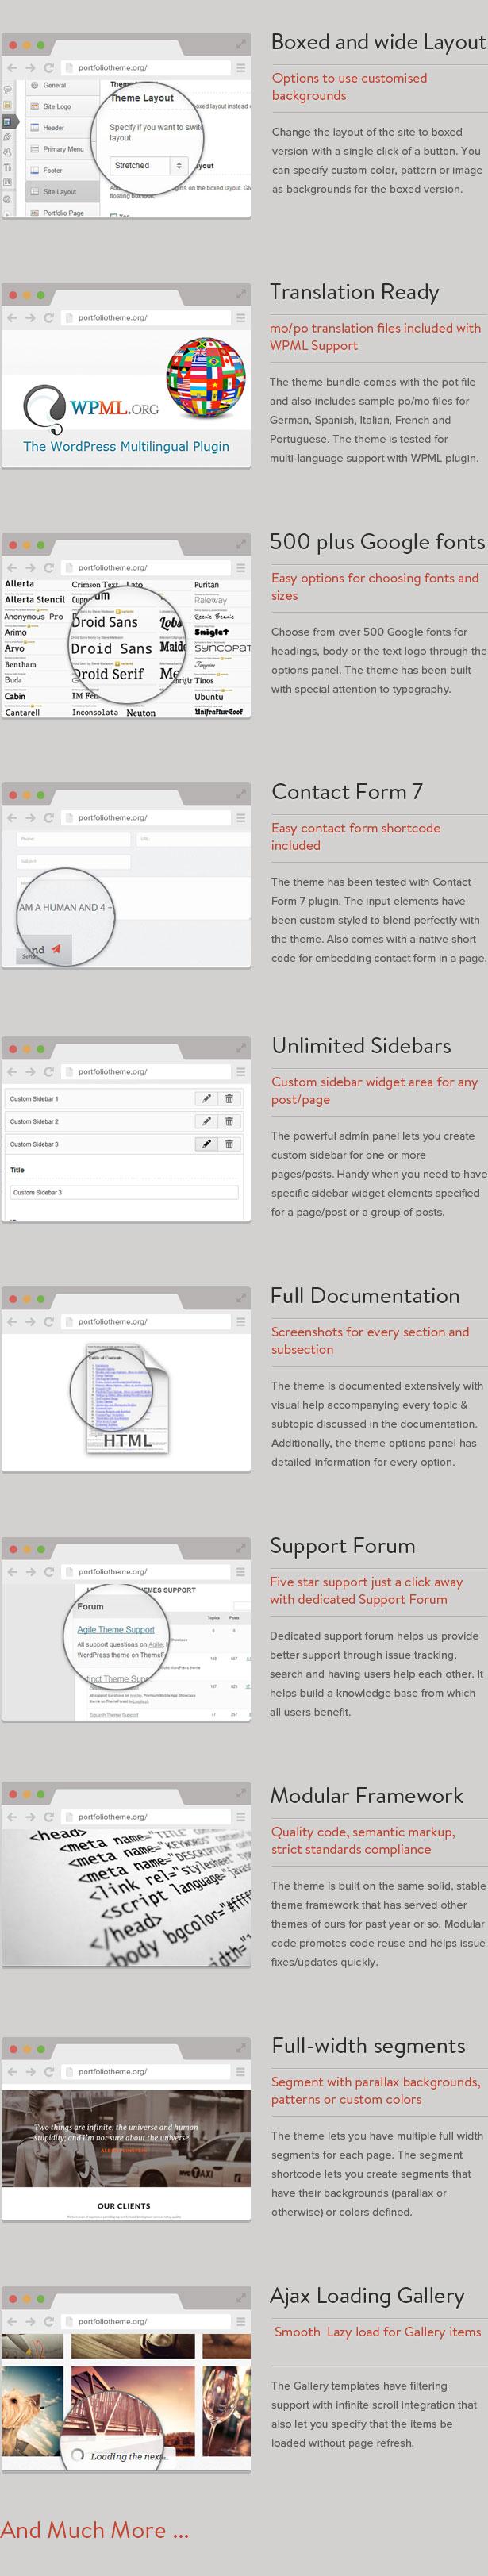 FitPro Eigenschaften3